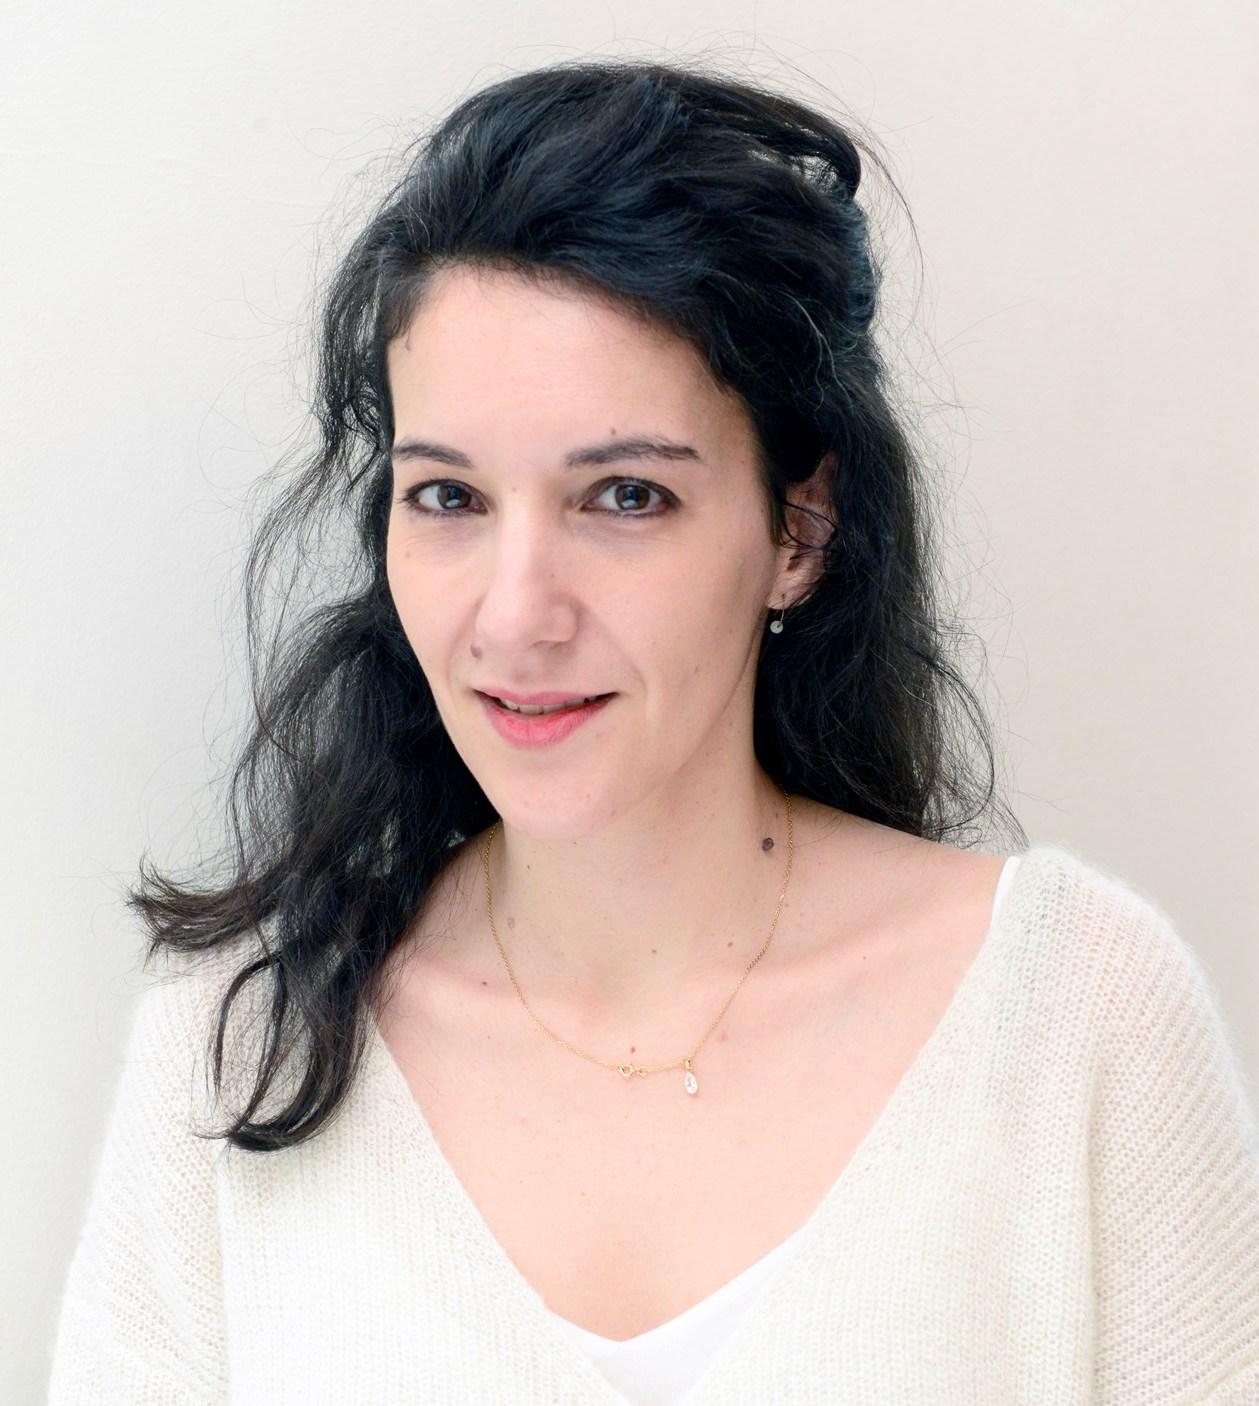 Nadia Francois Thevenot